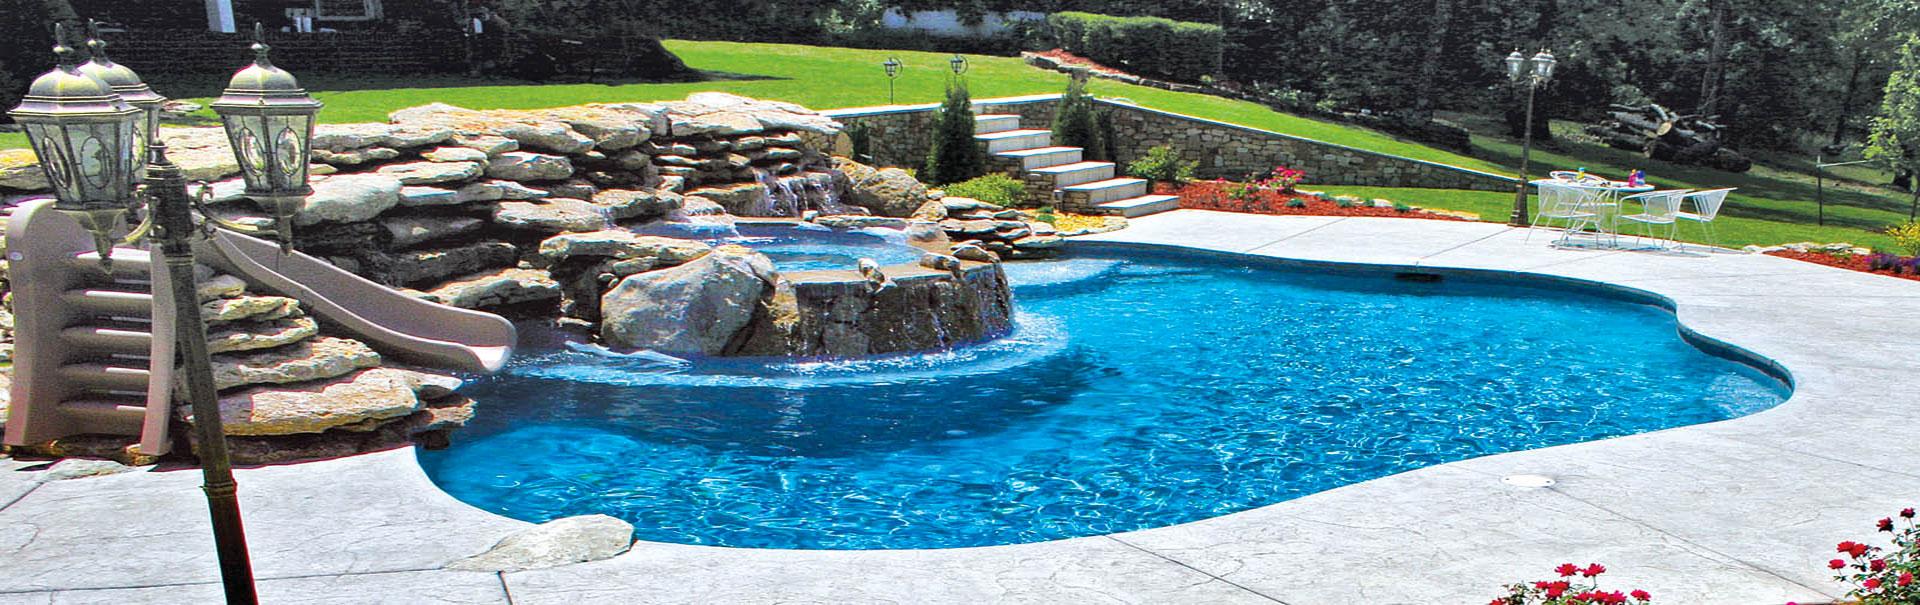 Tulsa Custom Swimming Pool Builders│Blue Haven Pools